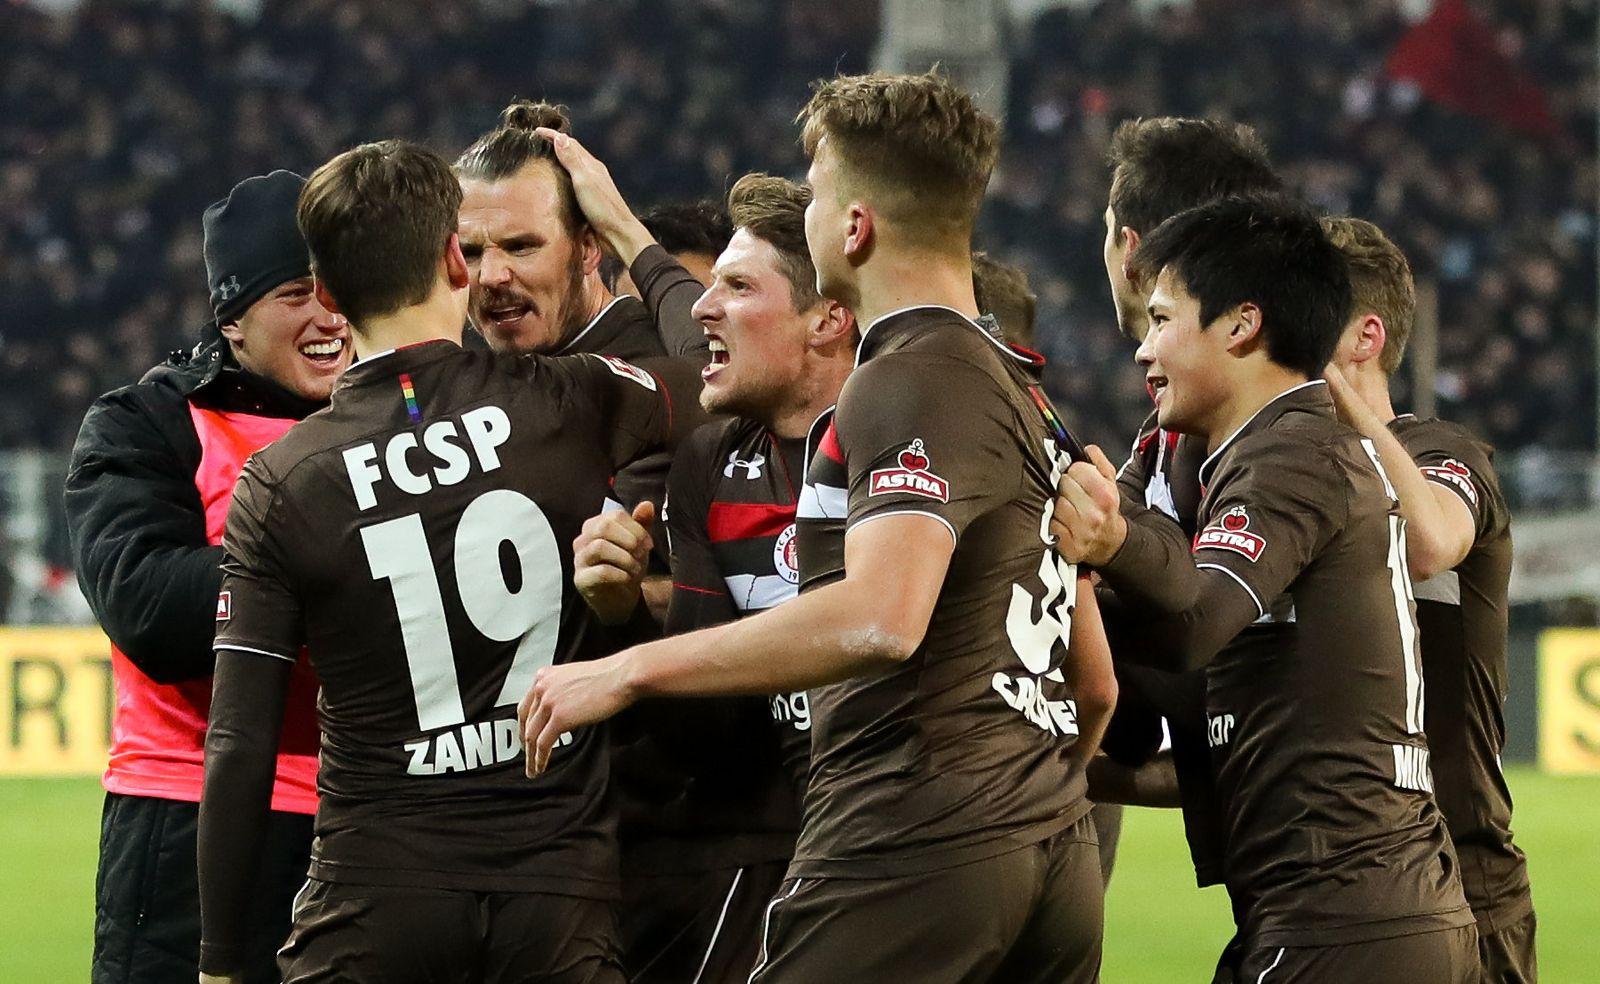 FC St. Pauli - 1. FC Union Berlin